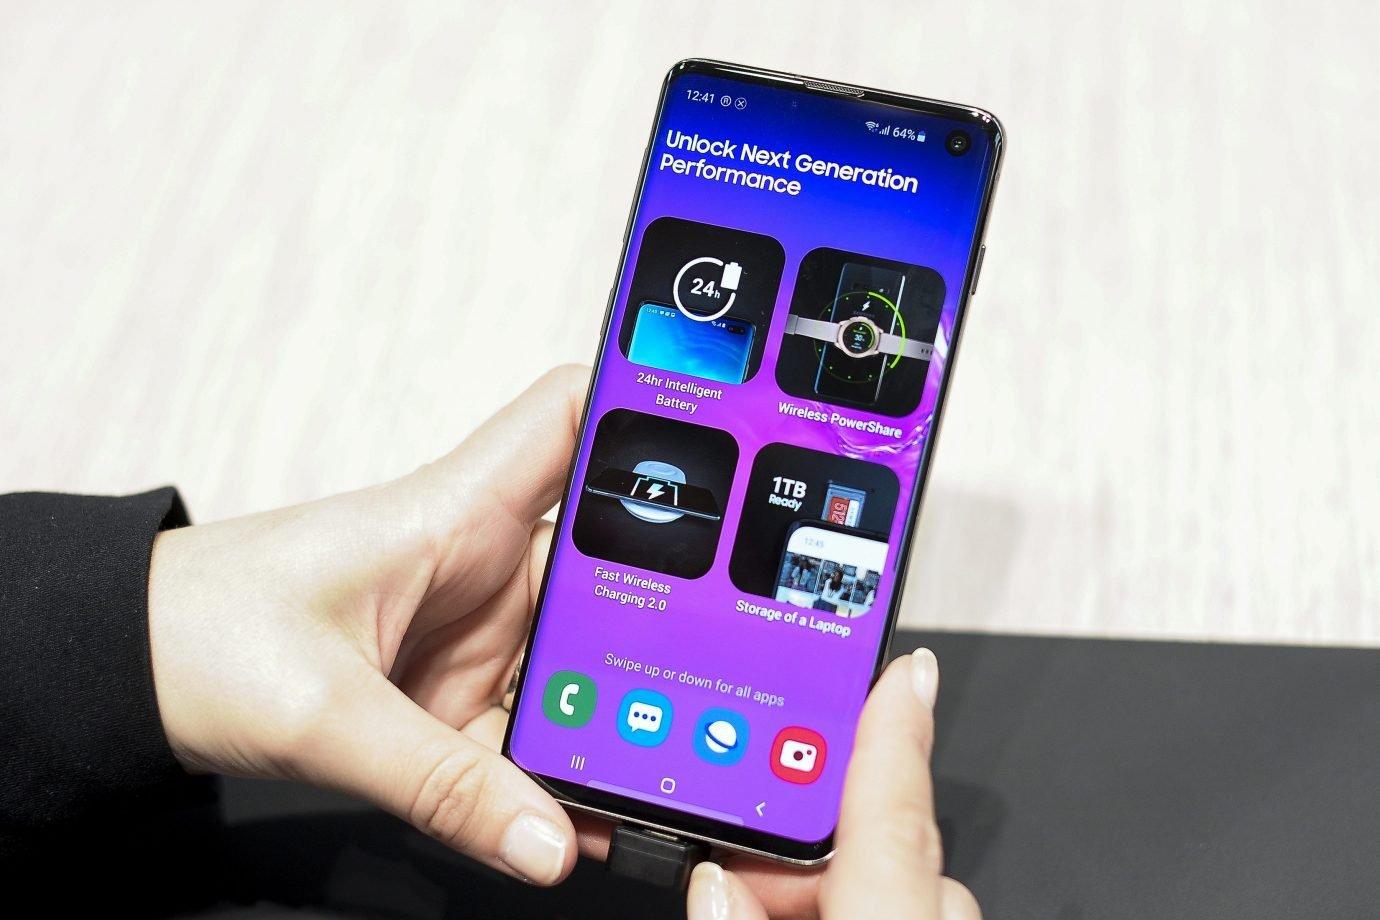 Samsung Galaxy S10 Mobile World Congress 2019 in Barcelona